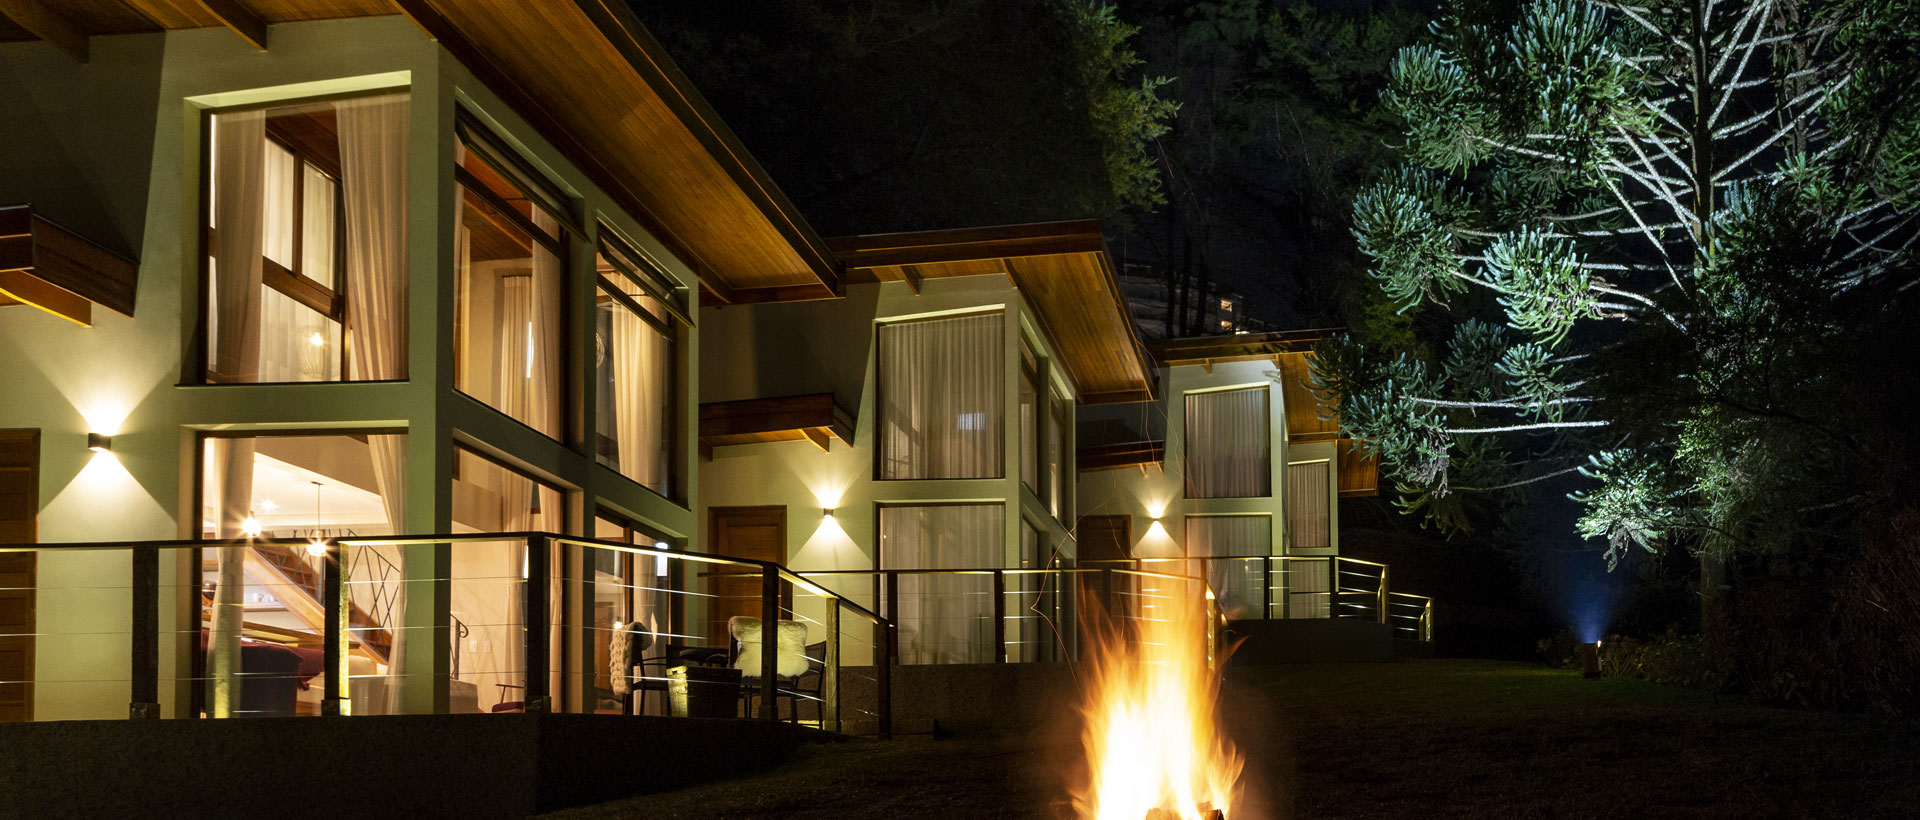 bangalow-hotel-boutique-quebra-noz-conforto-e-natureza2